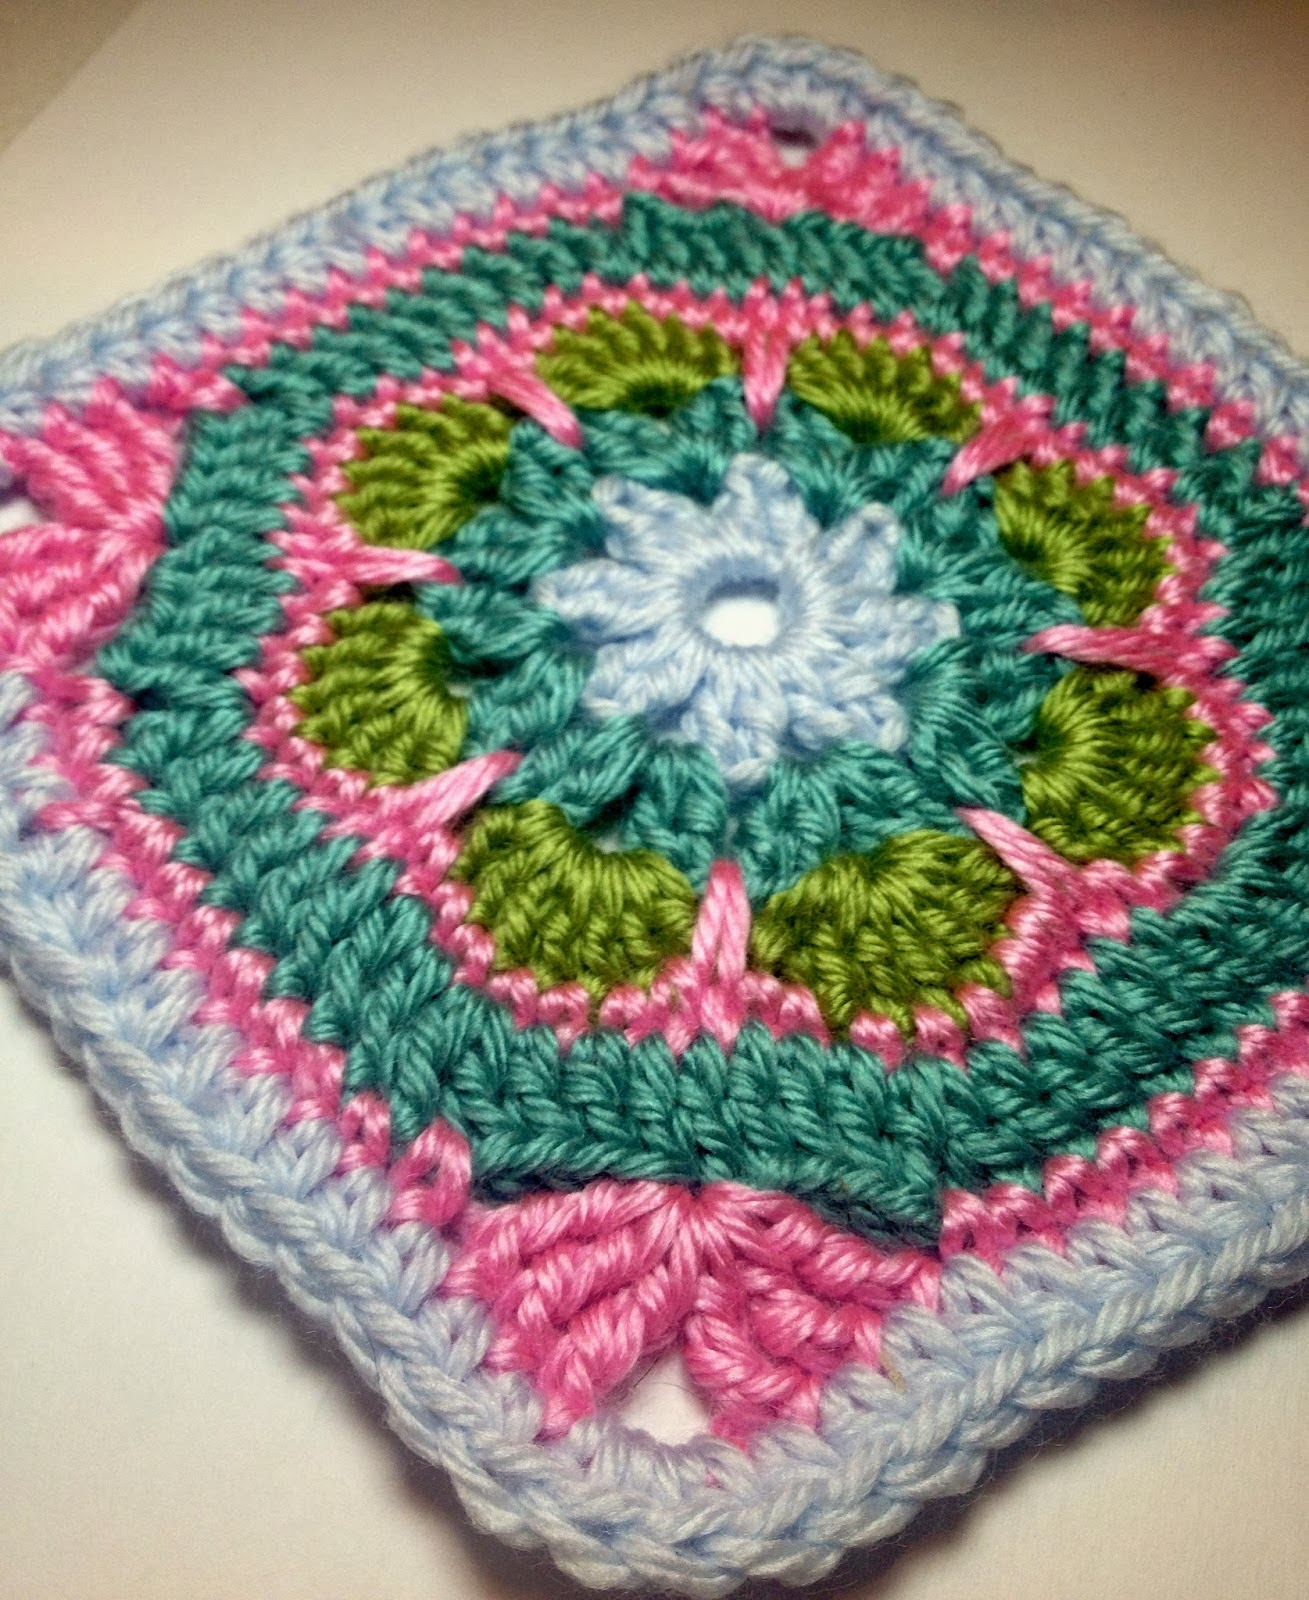 Crochet Squares : Free Crochet Patterns: Free Crochet Granny Square Motif Patterns